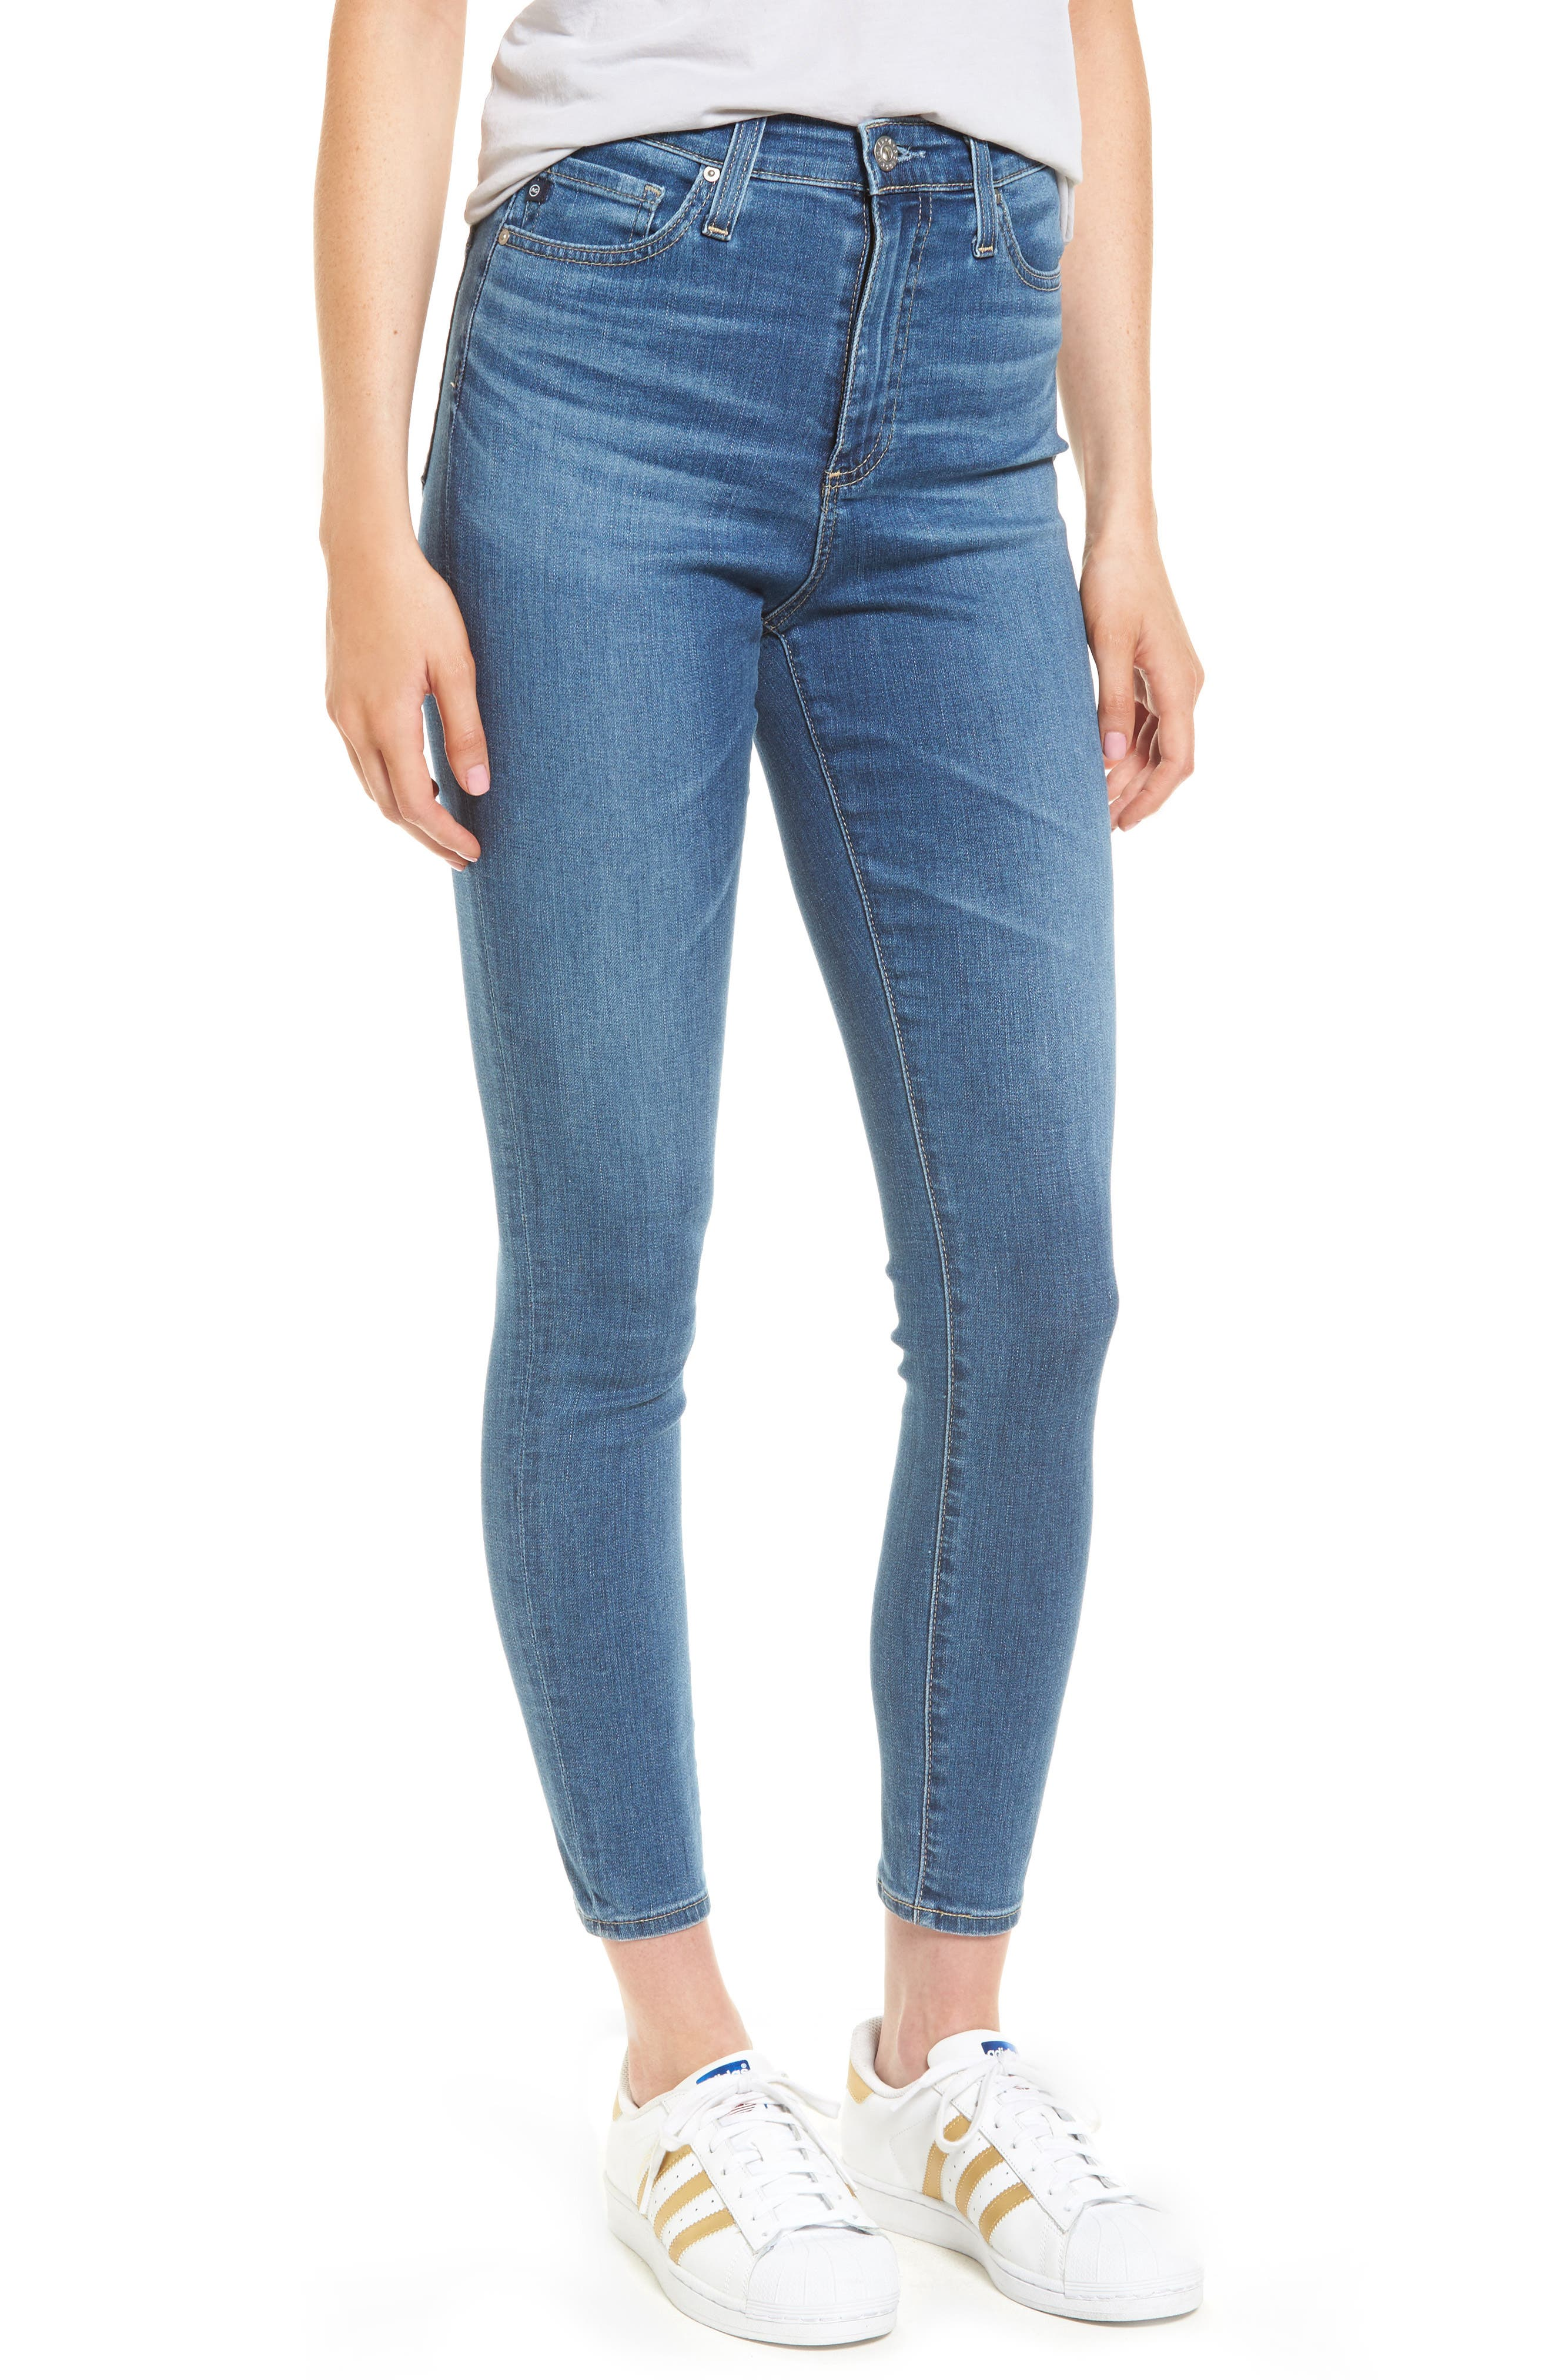 Mila High Waist Ankle Skinny Jeans,                             Main thumbnail 1, color,                             416